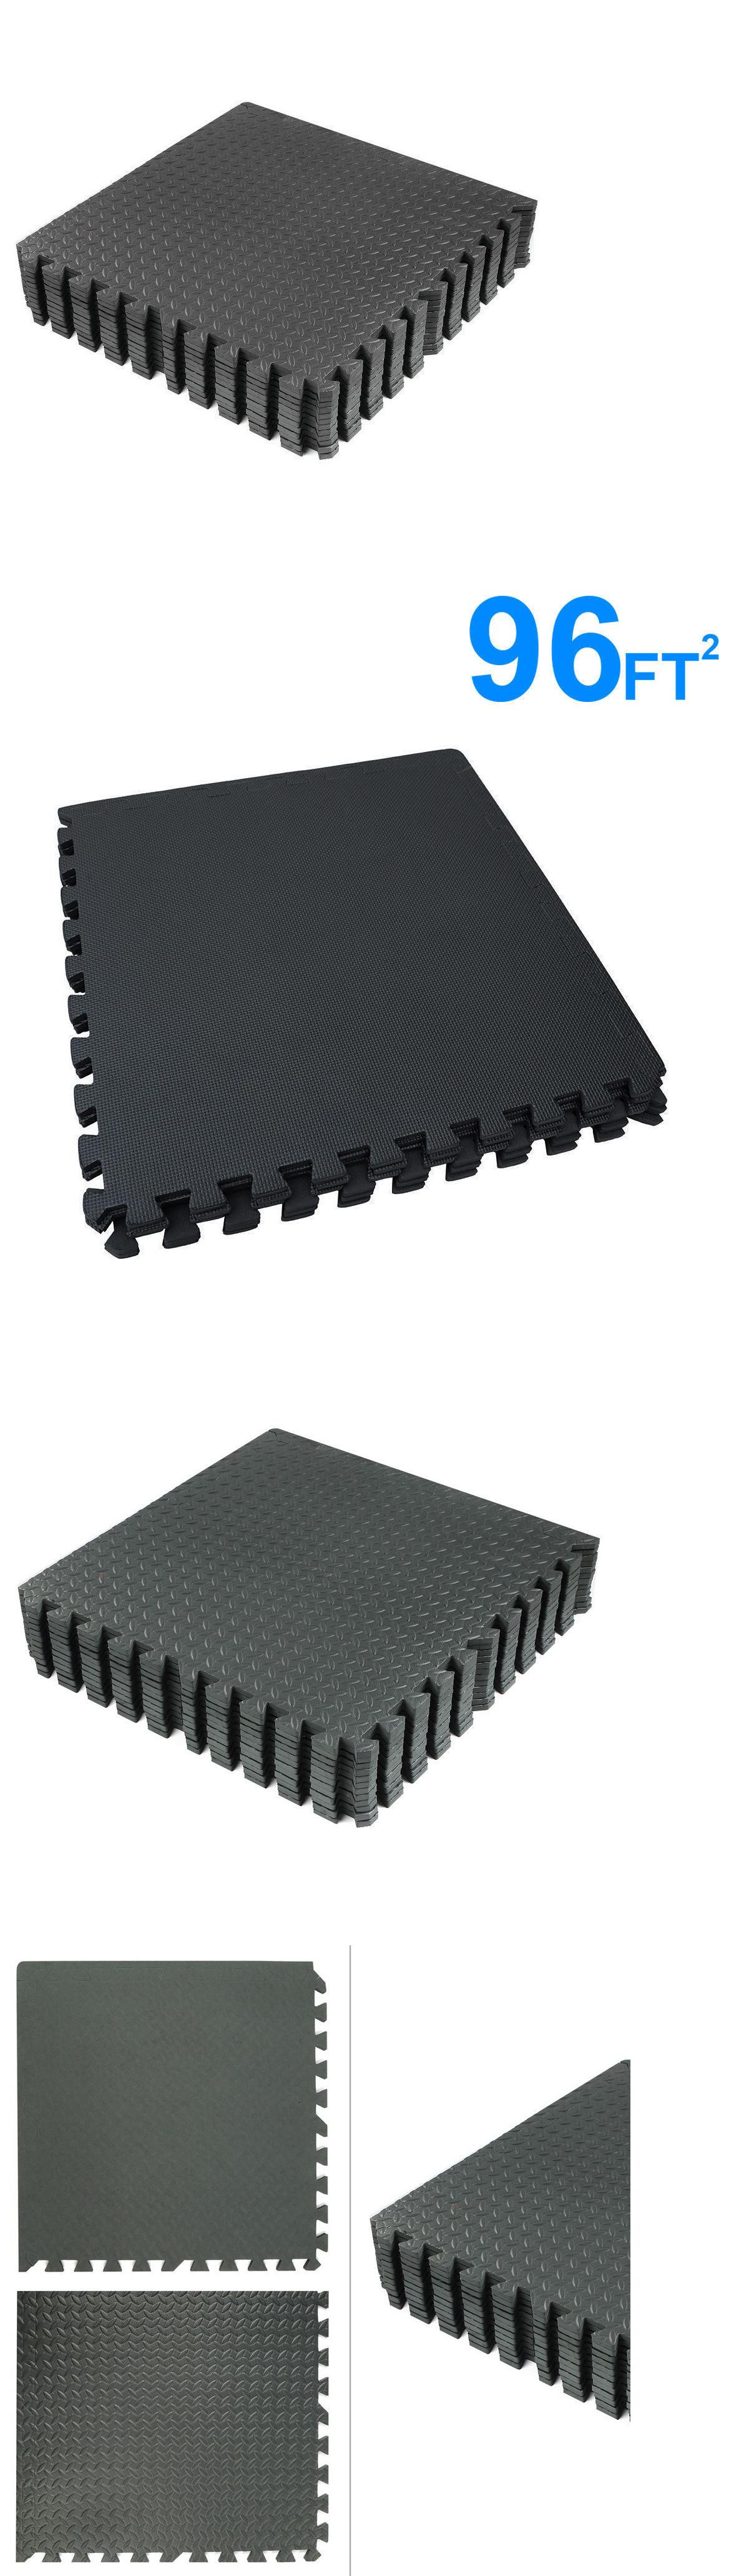 over pk interlocking product eva inch free of floor overstock orders on pack mats stalwart garden shipping home foam color ceec multi